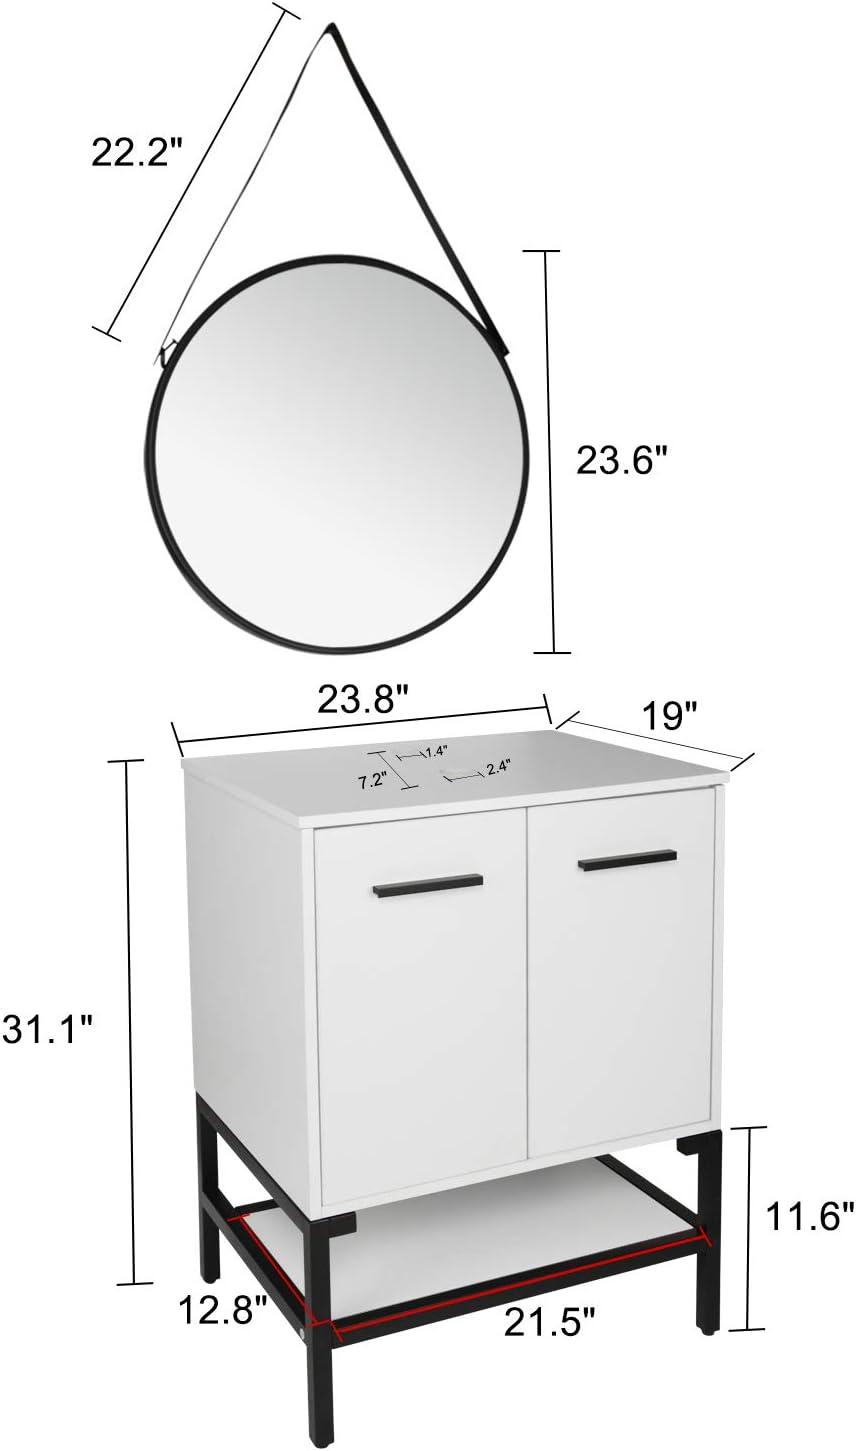 Buy Yourlite 24 Inch White Bathroom Vanity Modern And Stylish Design With Mirror Floor Cabinet Bathroom Vanity Online In Germany B08tbhbjmb